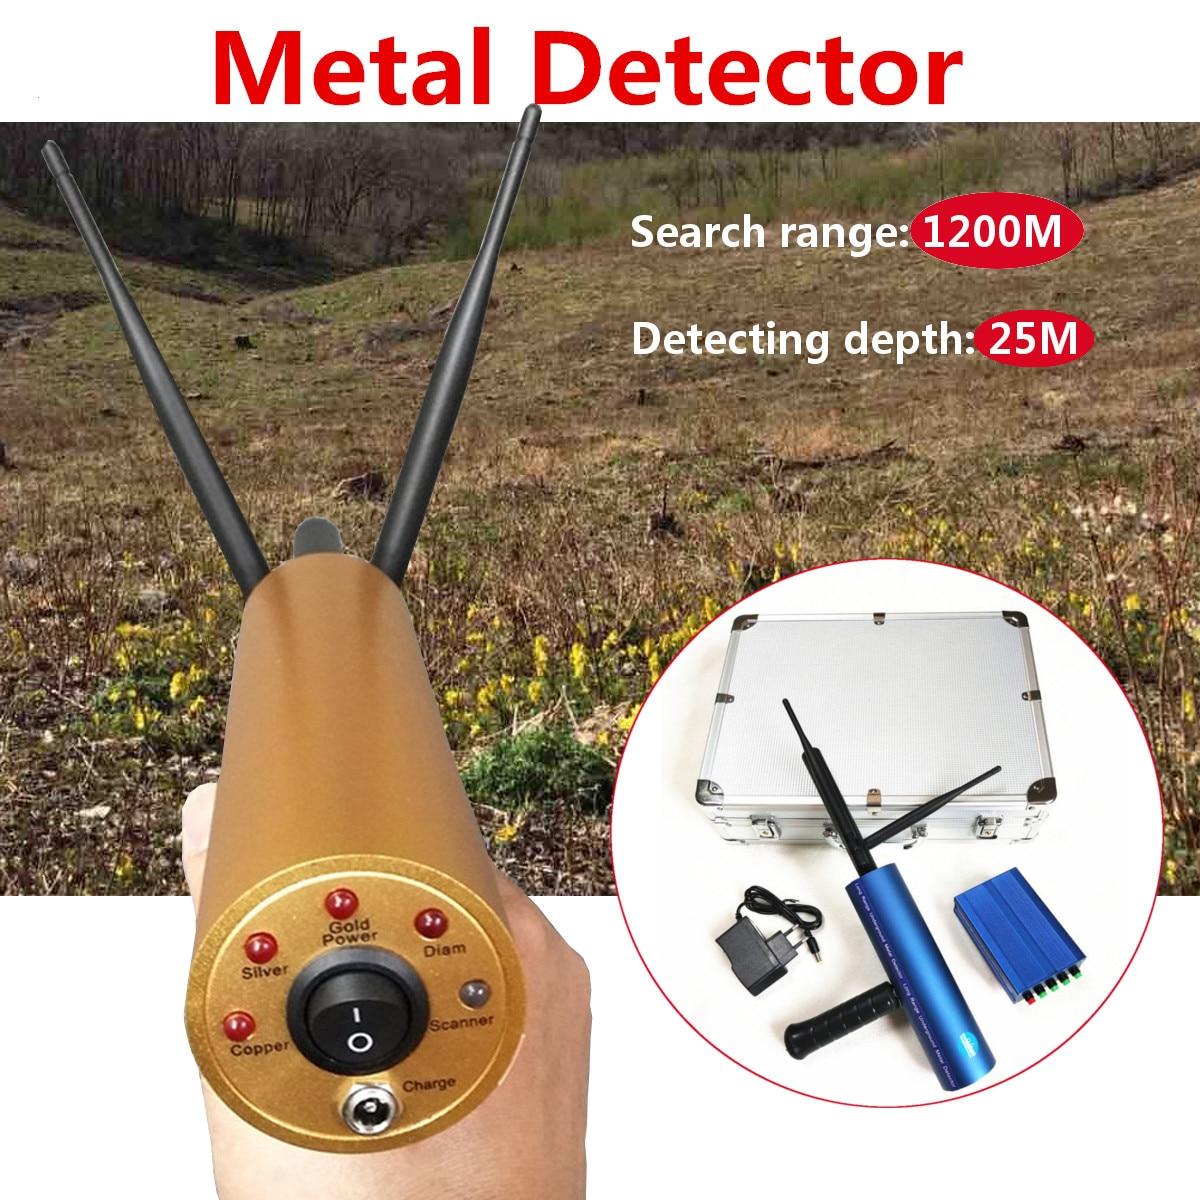 Professtional Metropolitana Gold Metal Detector 1200 m A Lungo Raggio di Ricerca Tesoro Finder Scanner Tracker Metallo Circuito Rivelatore